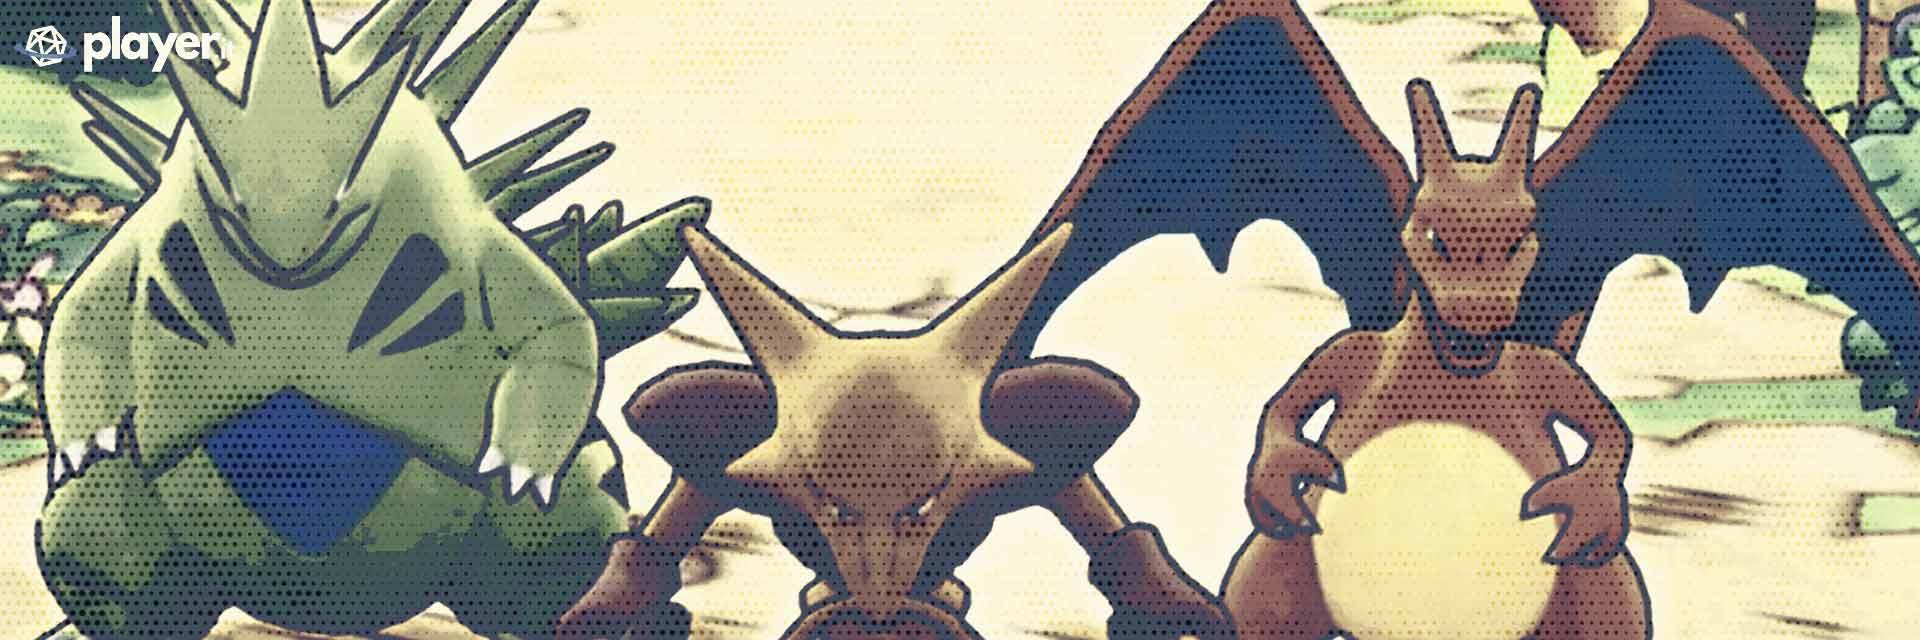 pokémon-mystery-dungeon-scheda-gioco